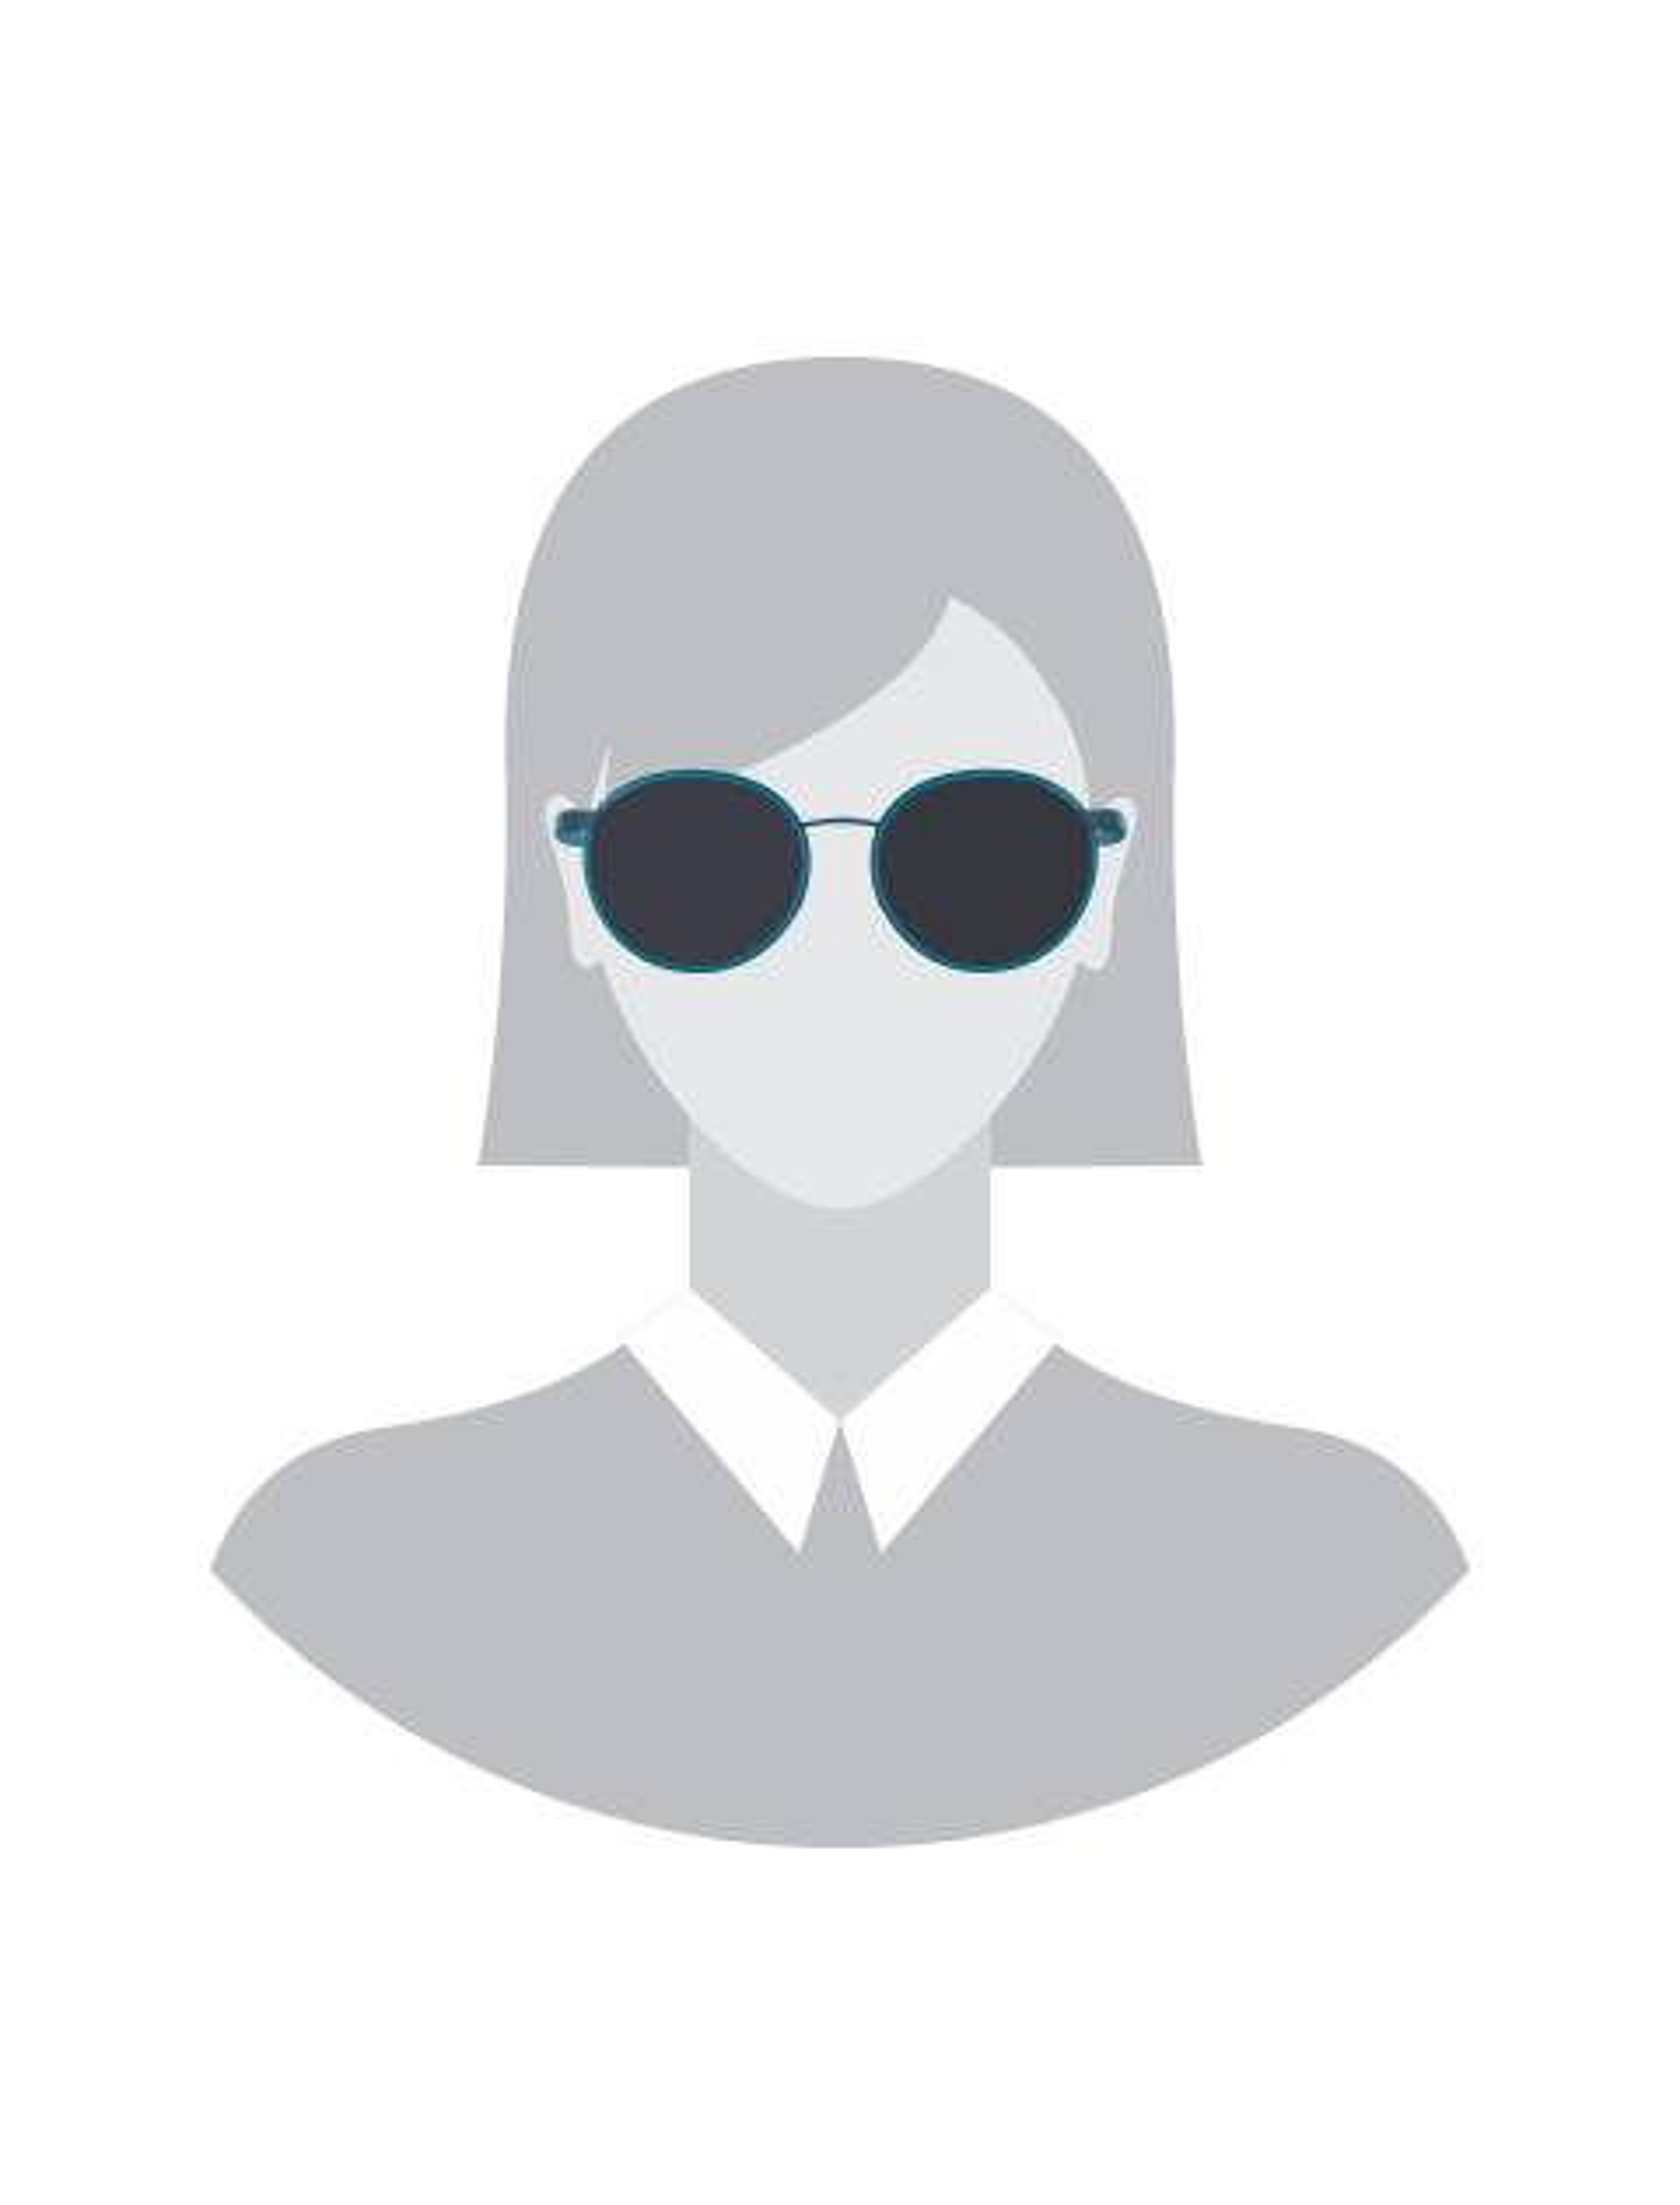 عینک آفتابی گرد زنانه - آبي - 5